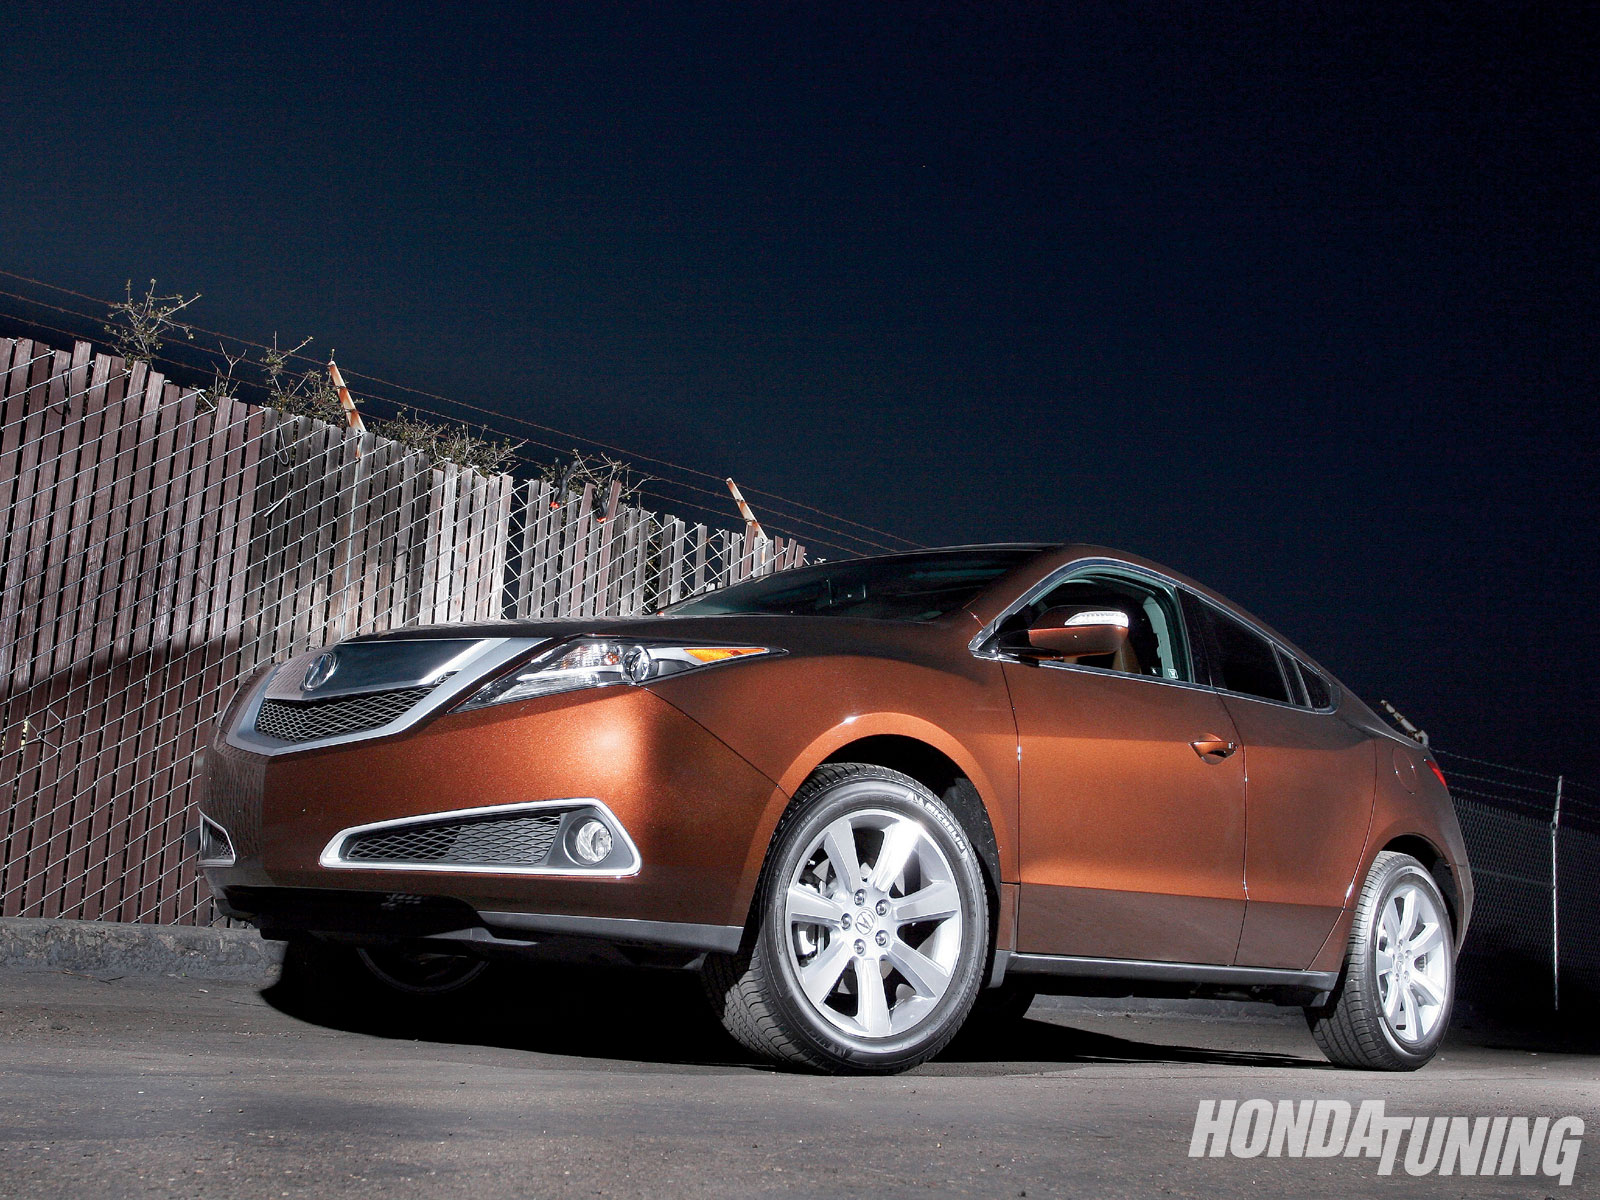 2010 Acura Zdx Drastic Makeover Honda Tuning Magazine